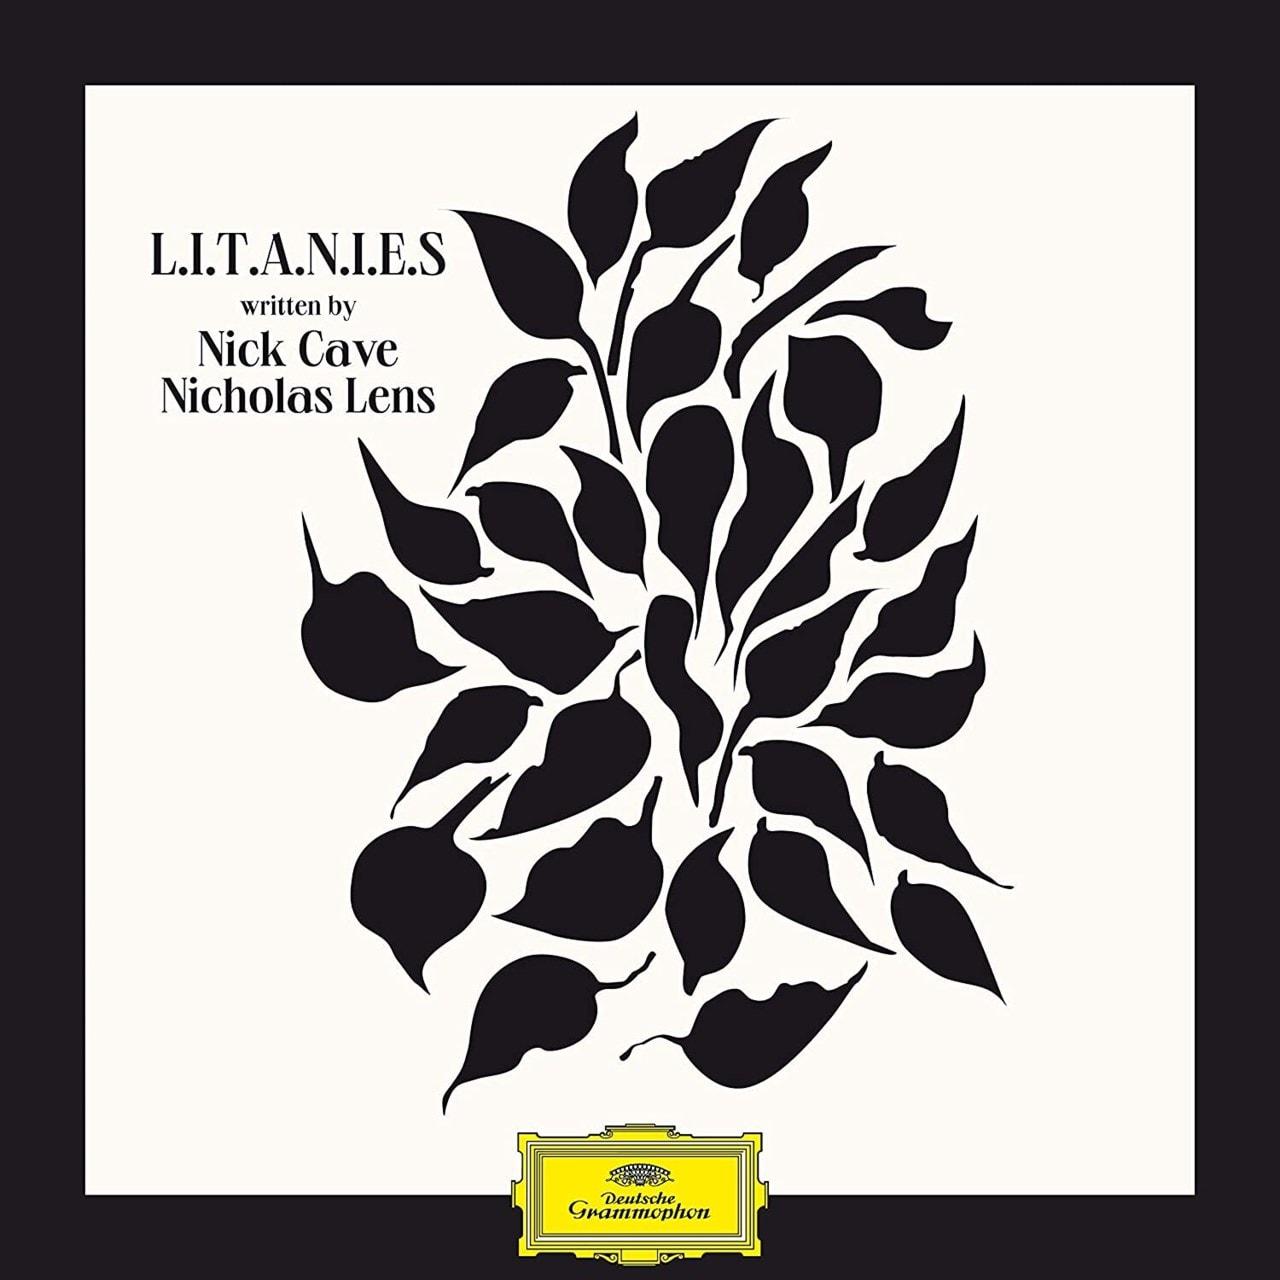 L.I.T.A.N.I.E.S Written By Nick Cave/Nicholas Lens - 1